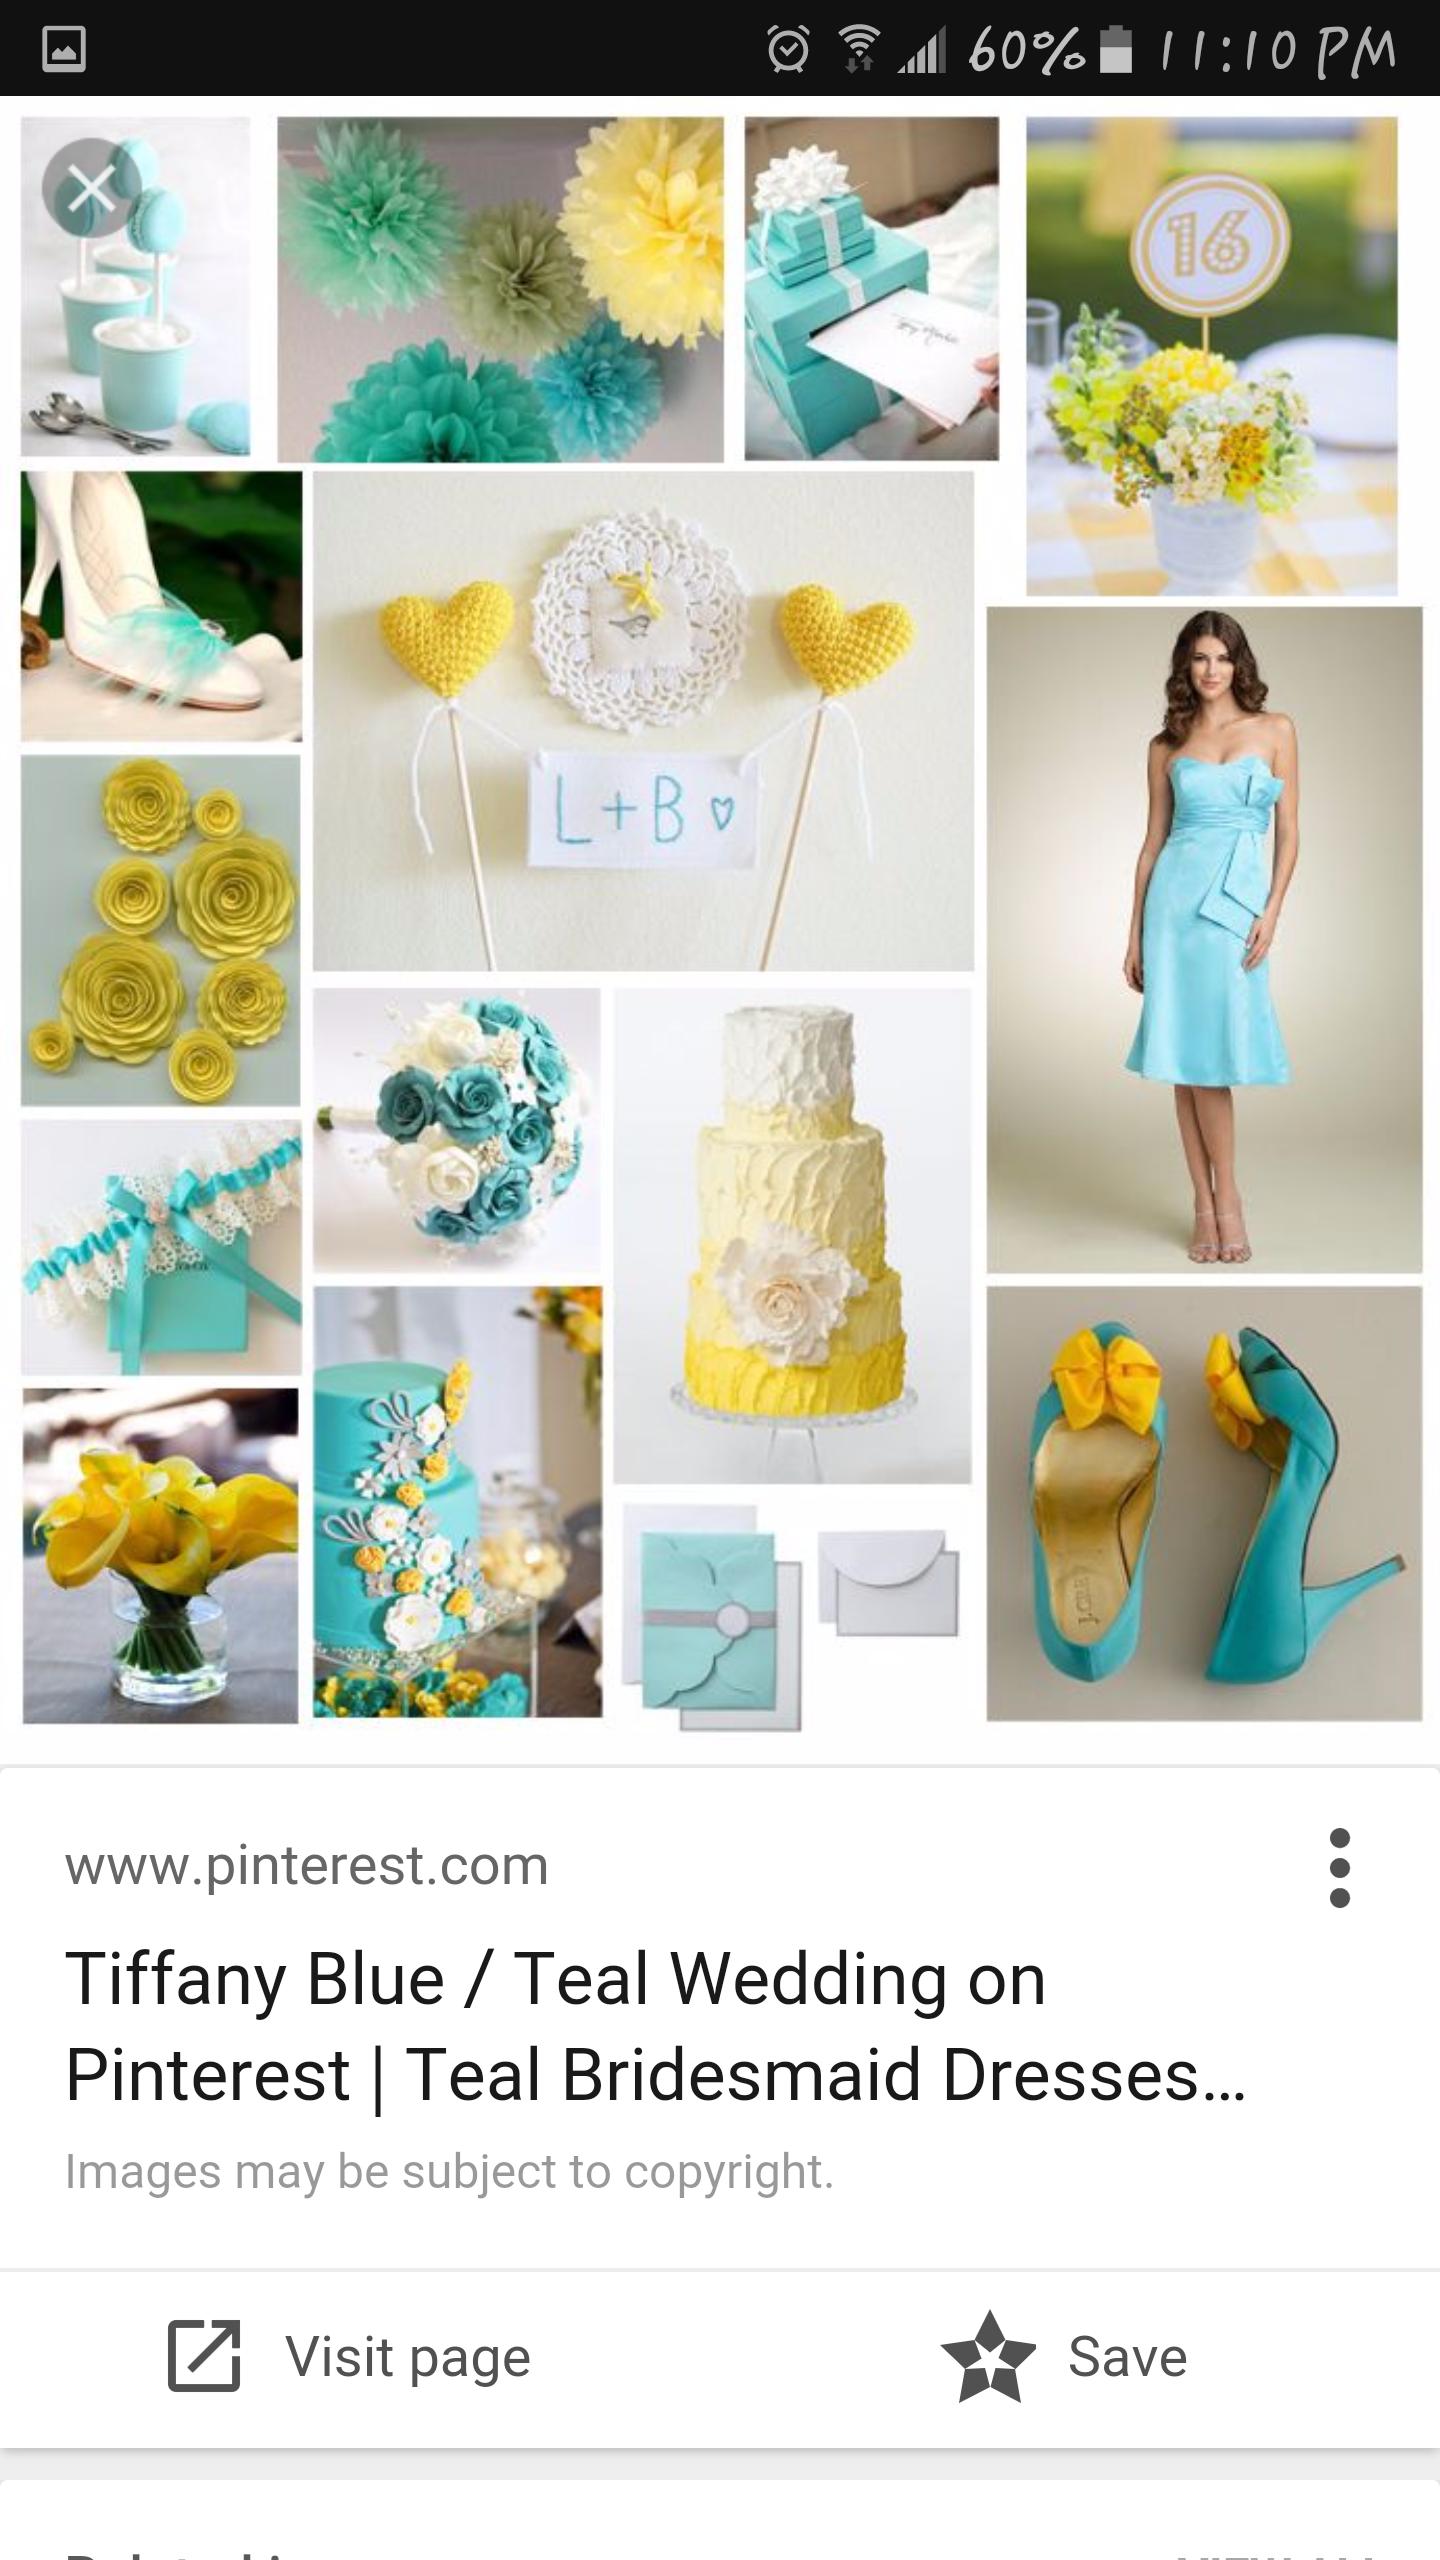 Pin by Leigha Smith on Wedding ideas | Pinterest | Wedding